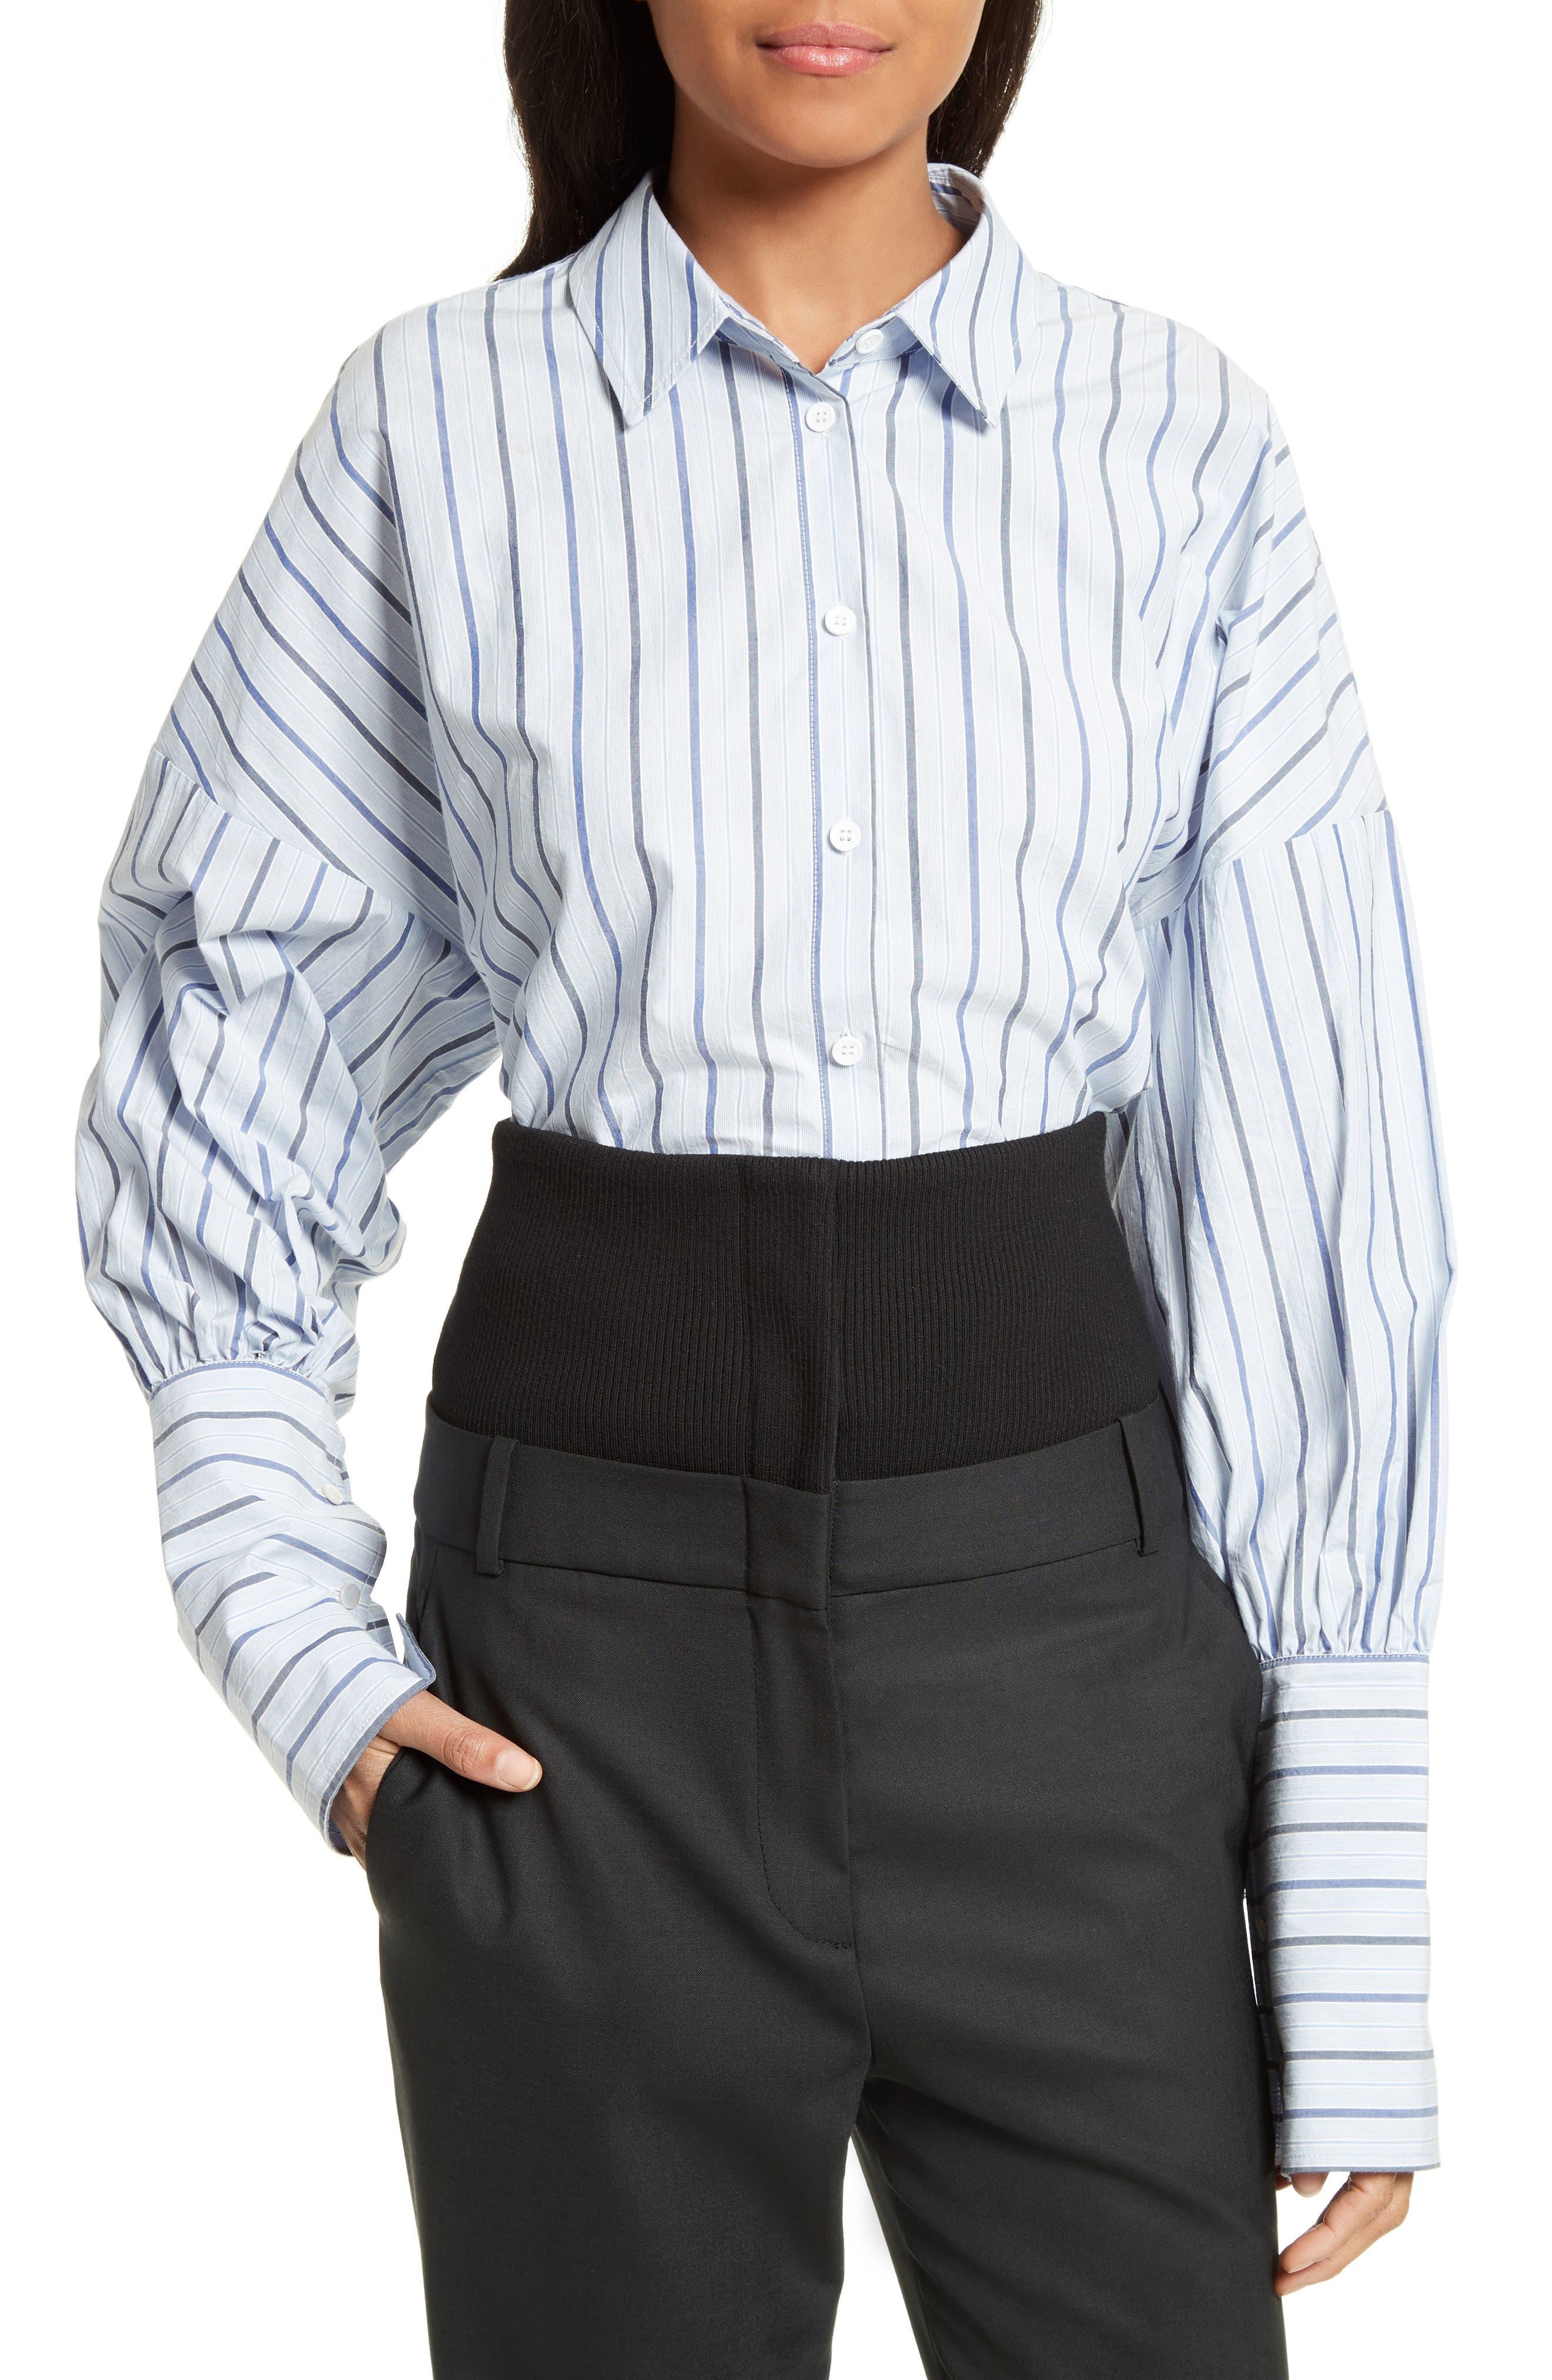 Garçon Stripe Easy Shirt,                         Main,                         color, 402